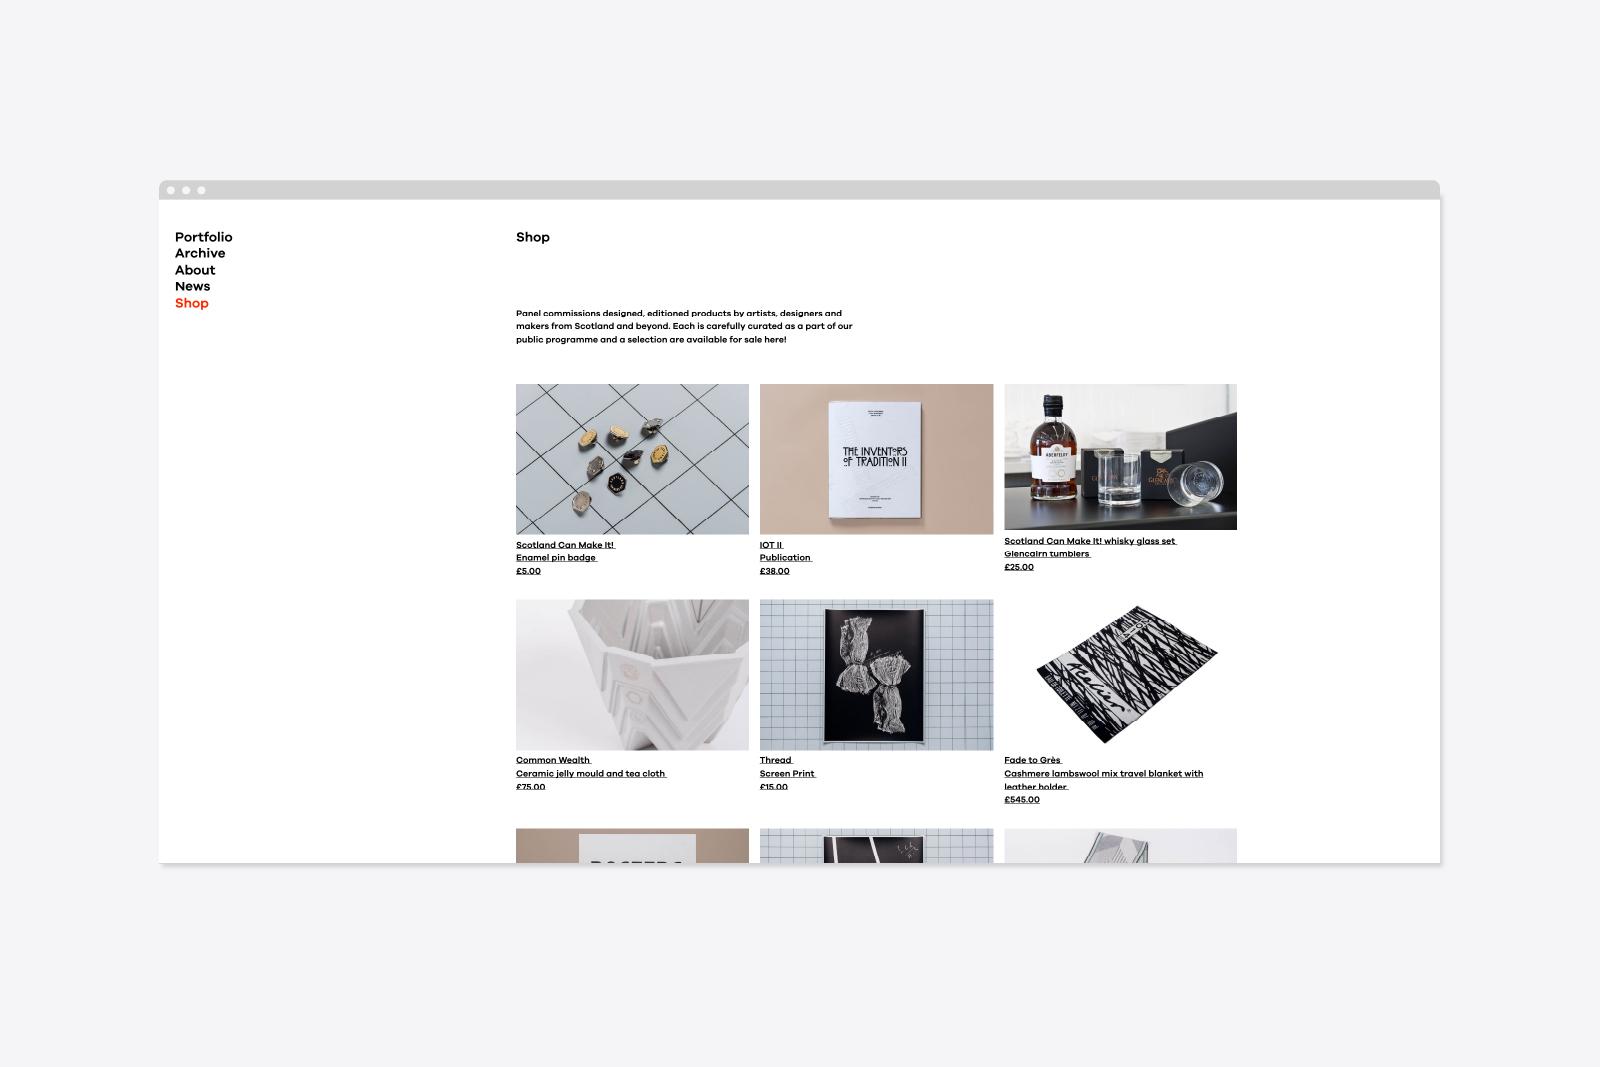 ostreet-panel-web-06